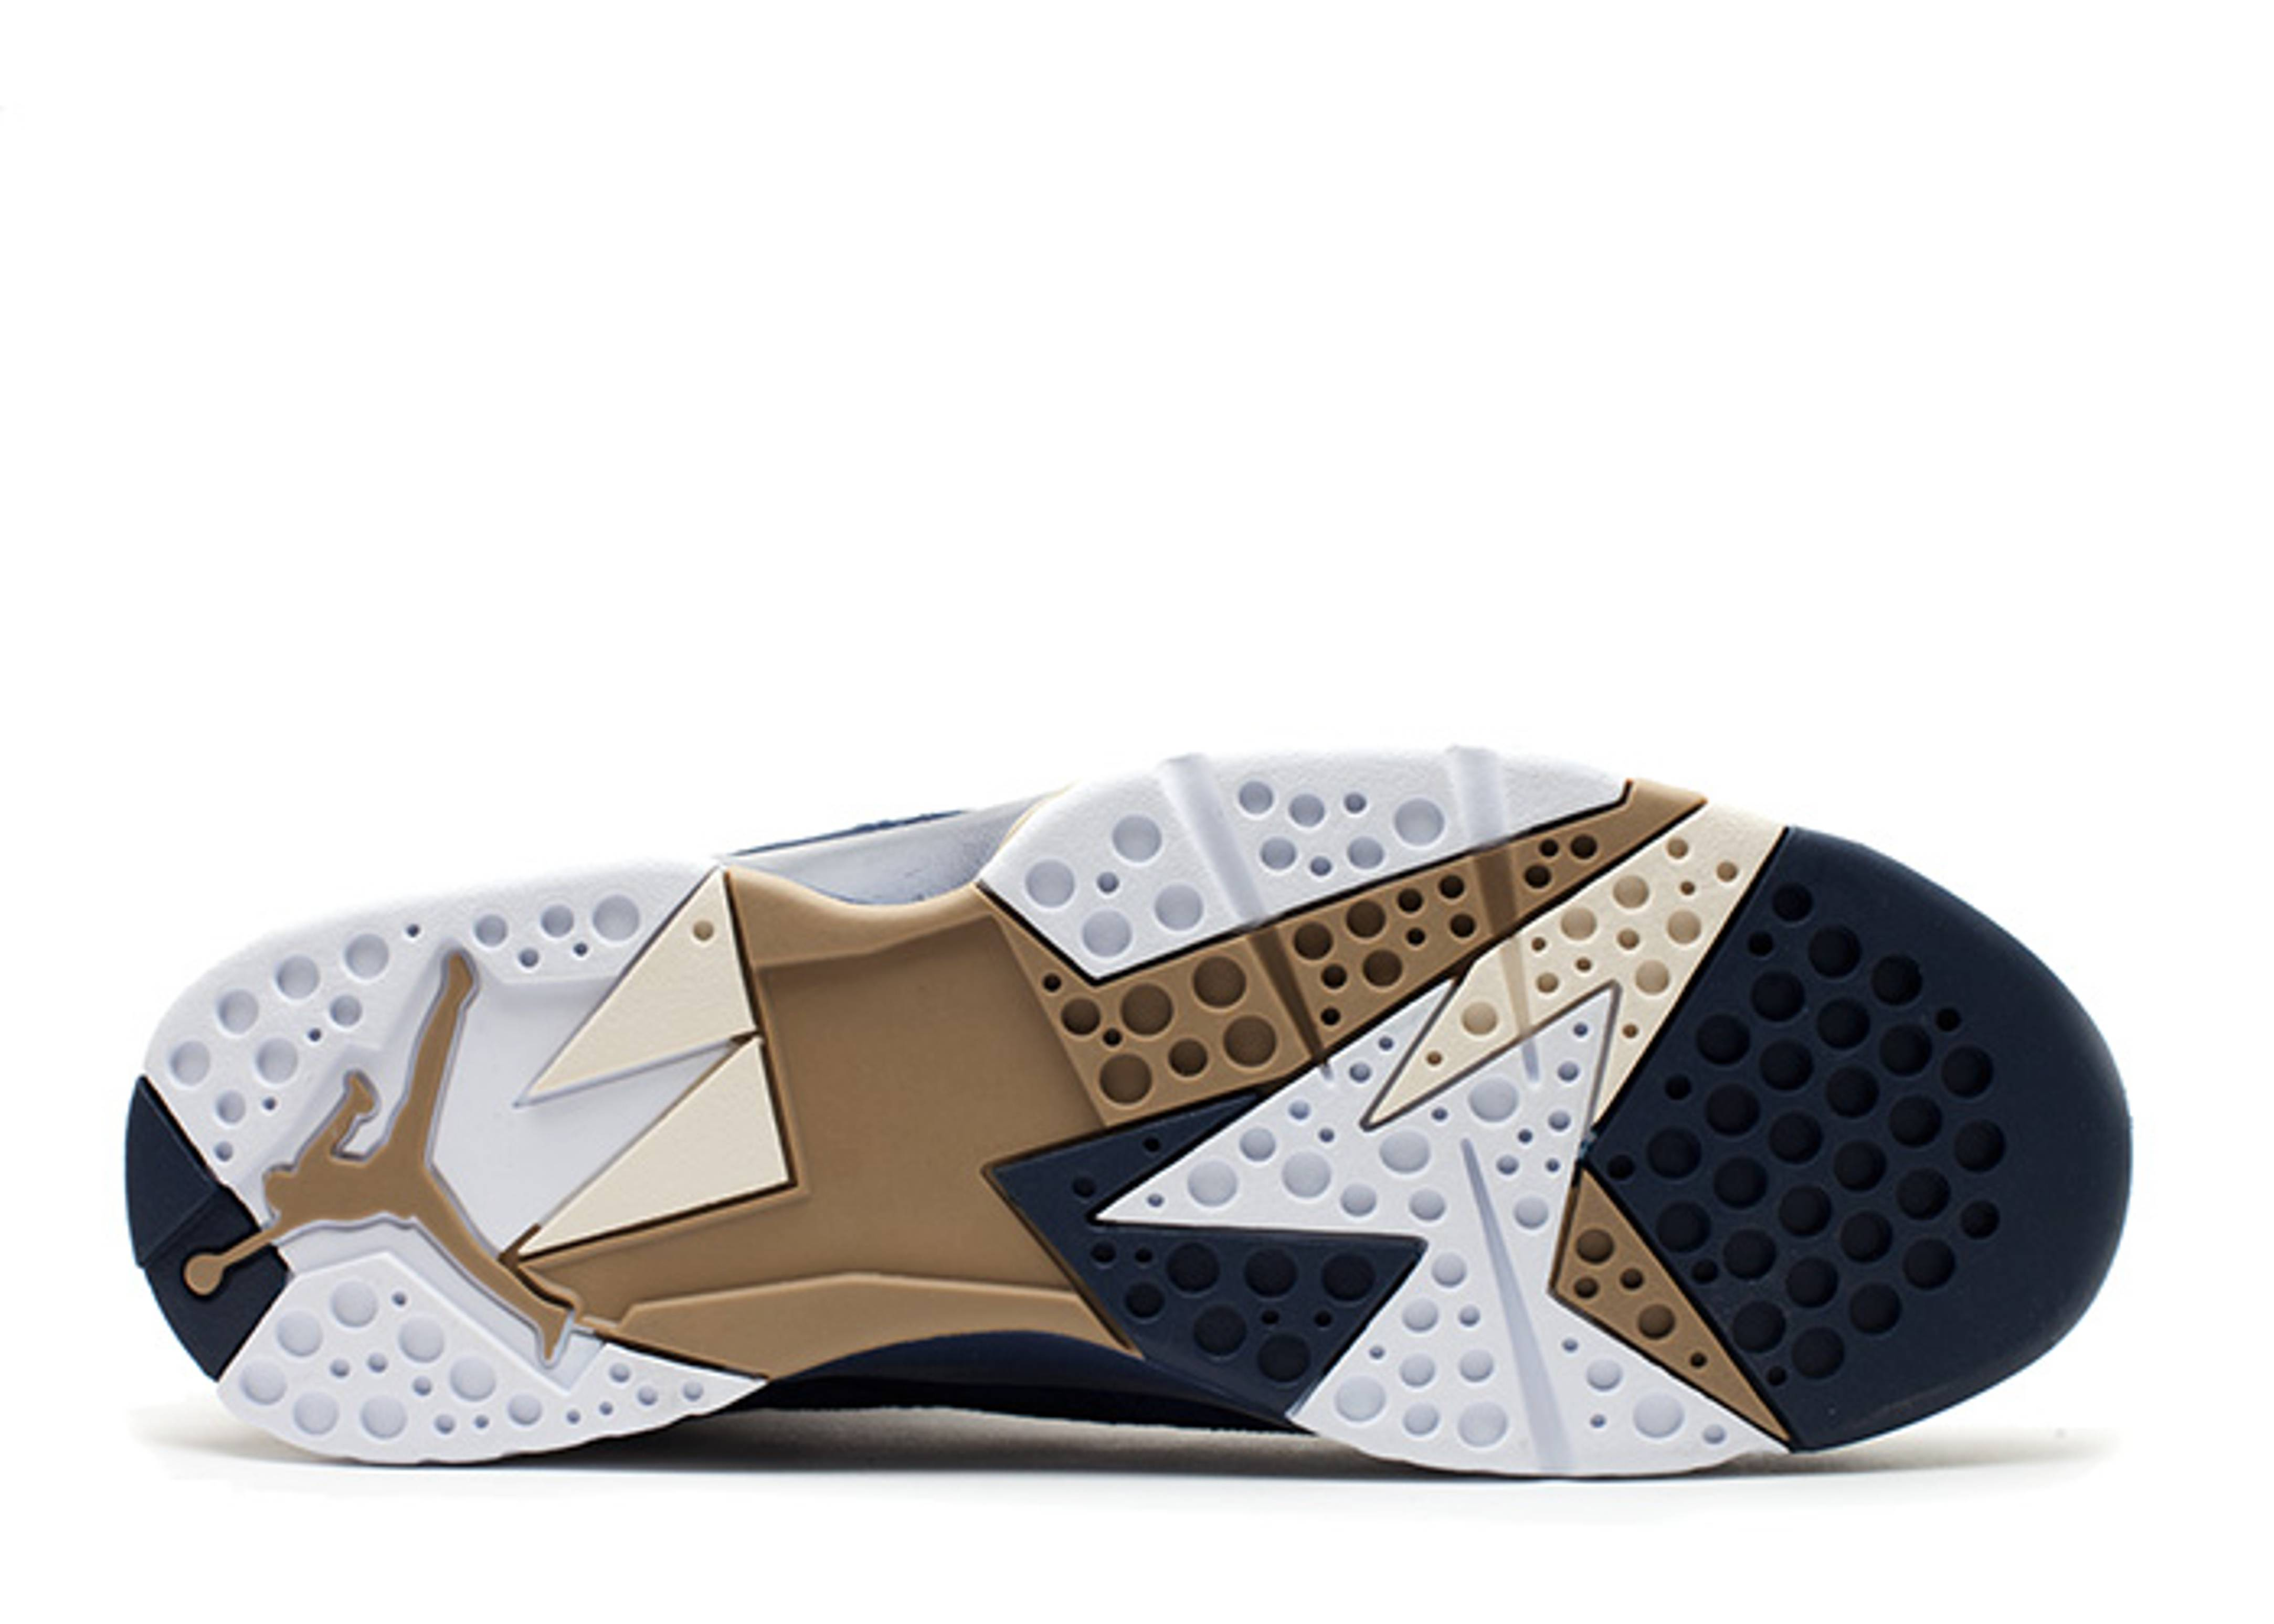 innovative design 80d2b 0133c Jordan 7 Retro J2K Obsidian  Air Jordan 7 Retro J2k ...